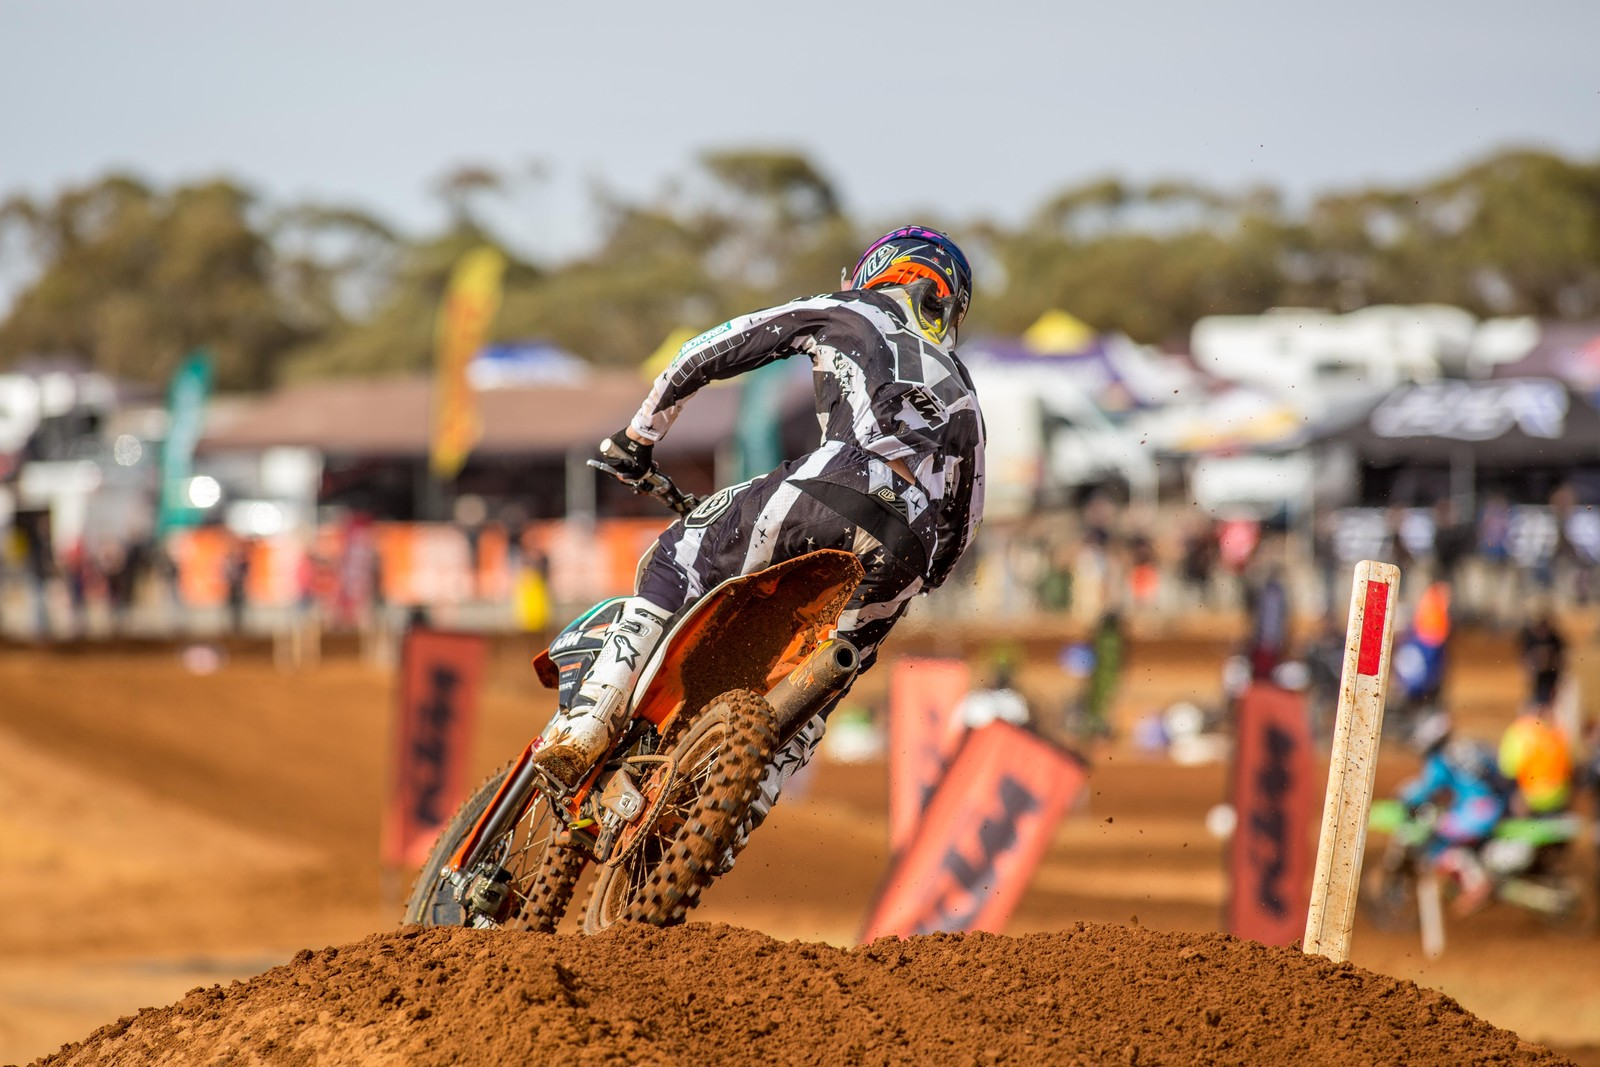 Caleb Ward - Australian Motul Mx Championships: Round 4, Murray Bridge - Motocross Pictures - Vital MX